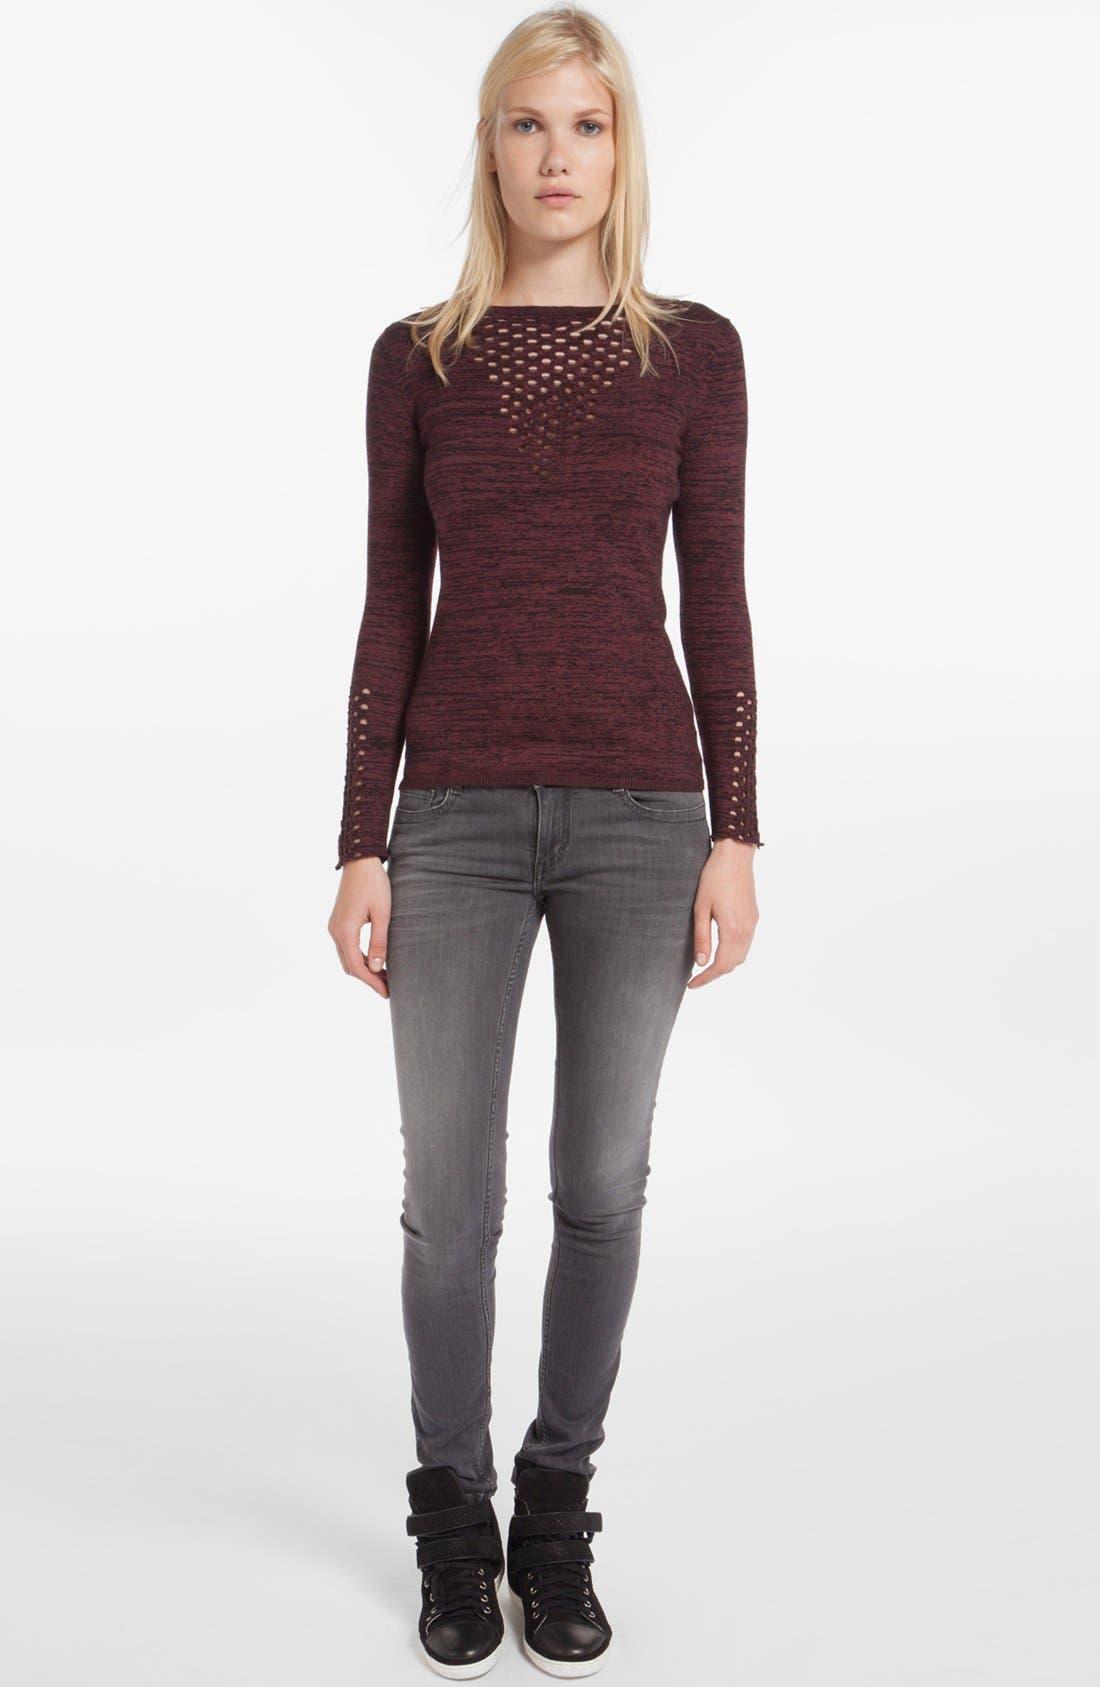 Alternate Image 1 Selected - maje 'Dramaturg' Perforated Sweater